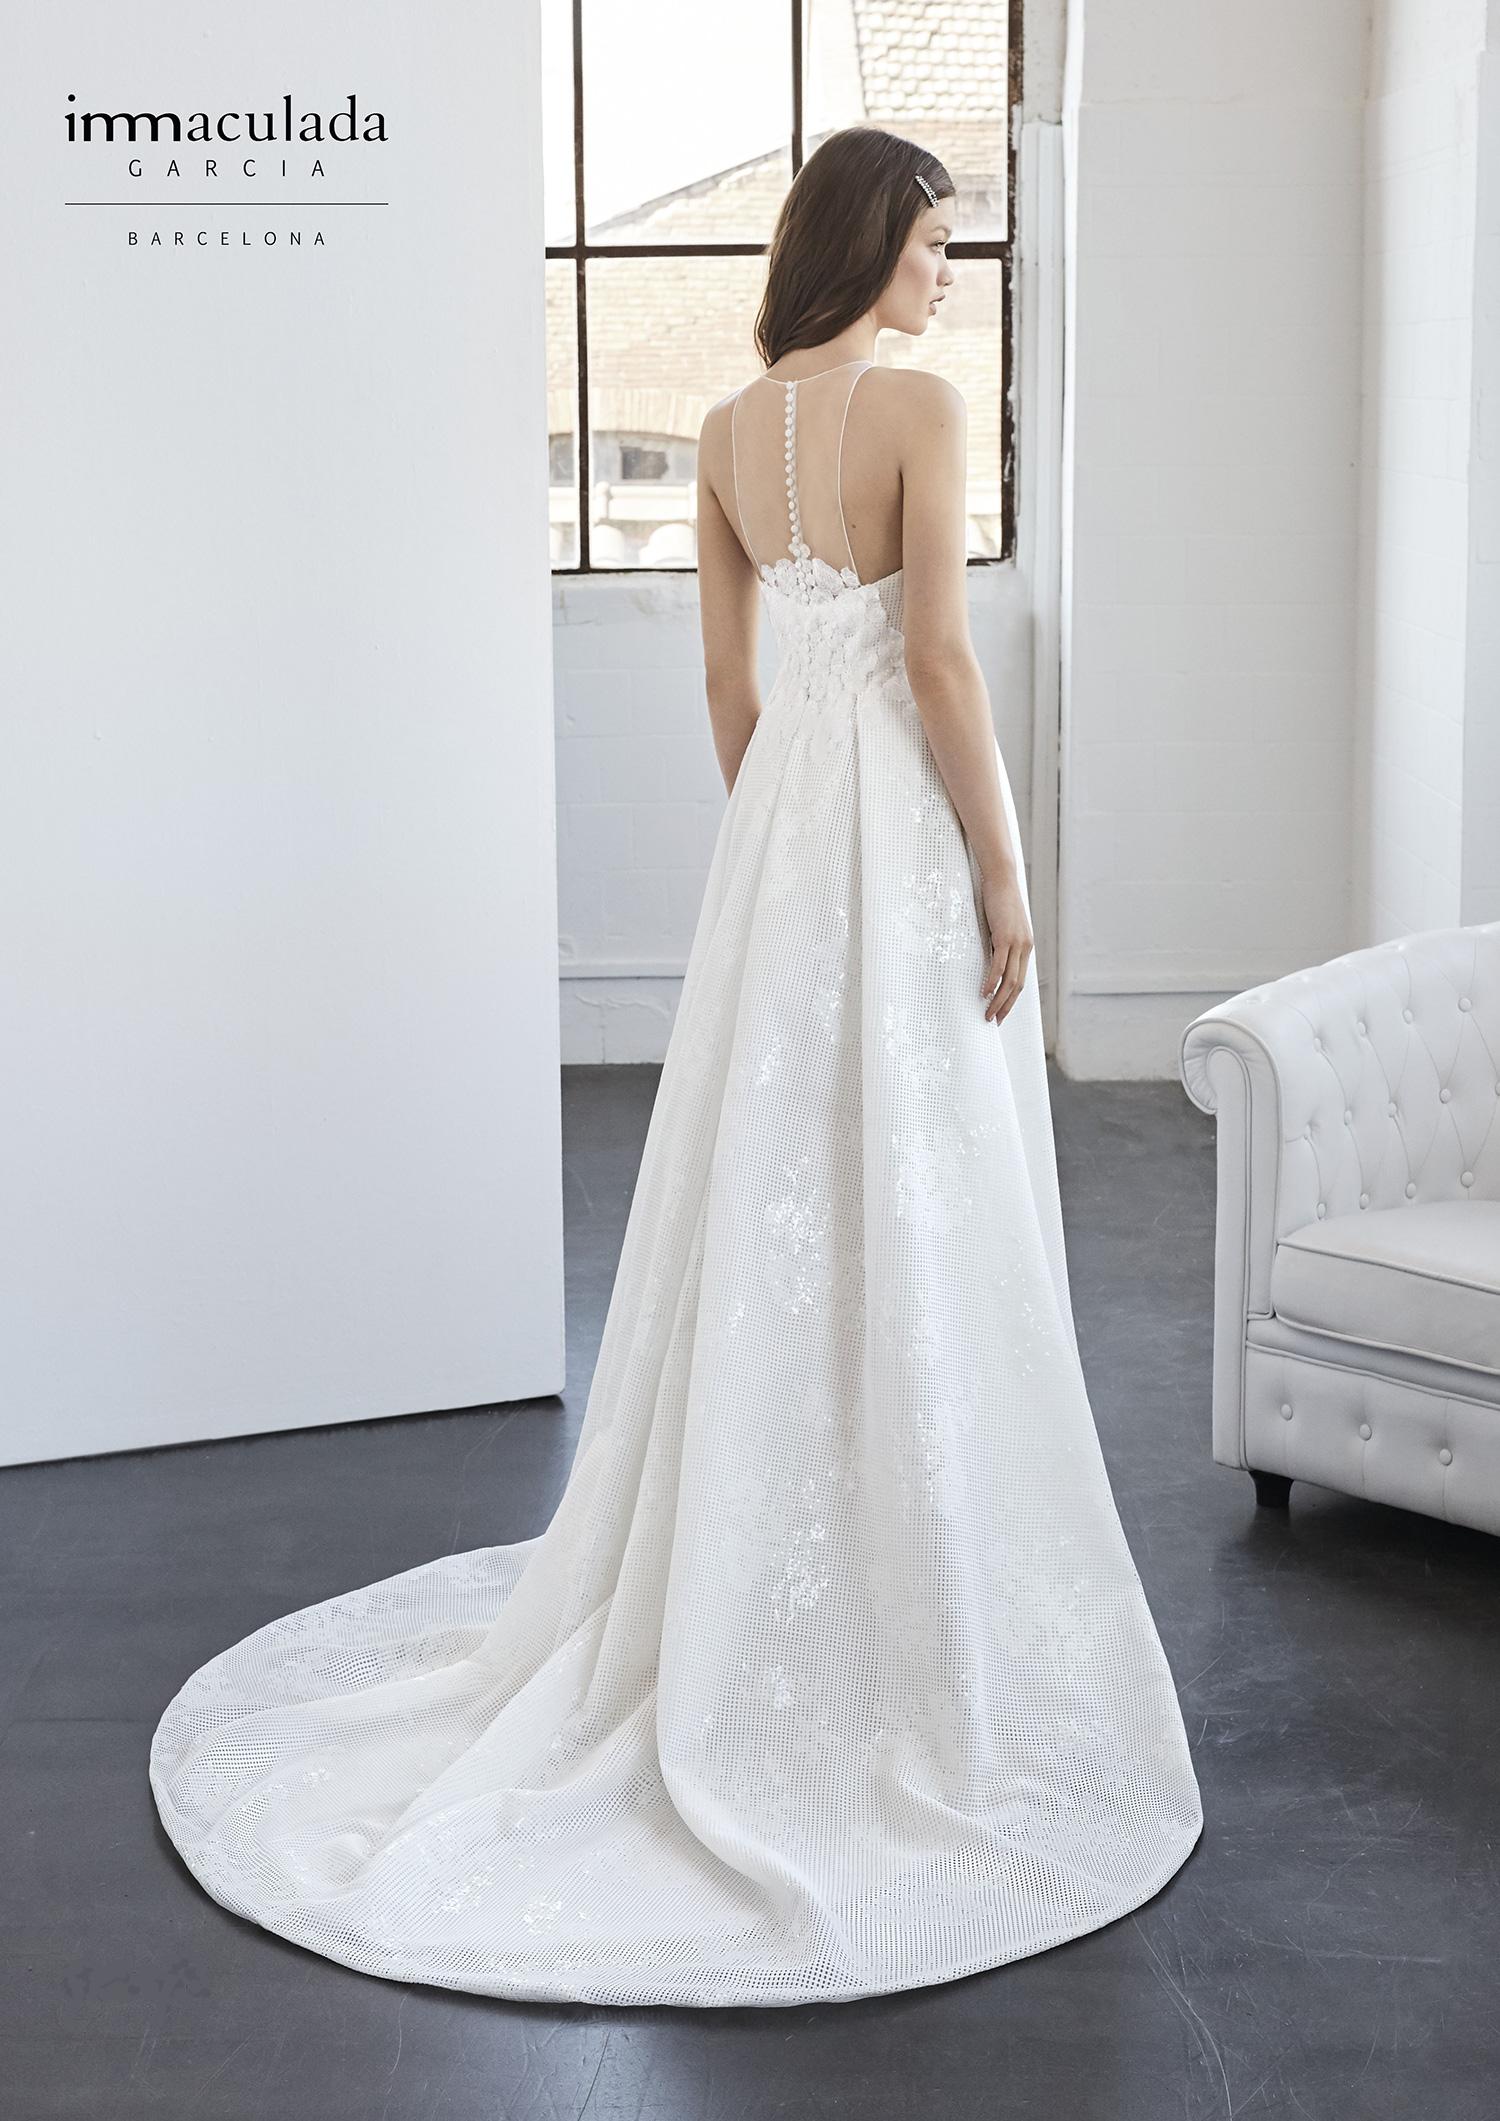 Nuova collezione 2018 Vestitida Sposa Inmaculada Garcia - Fleur de Lys Atelier Sposa